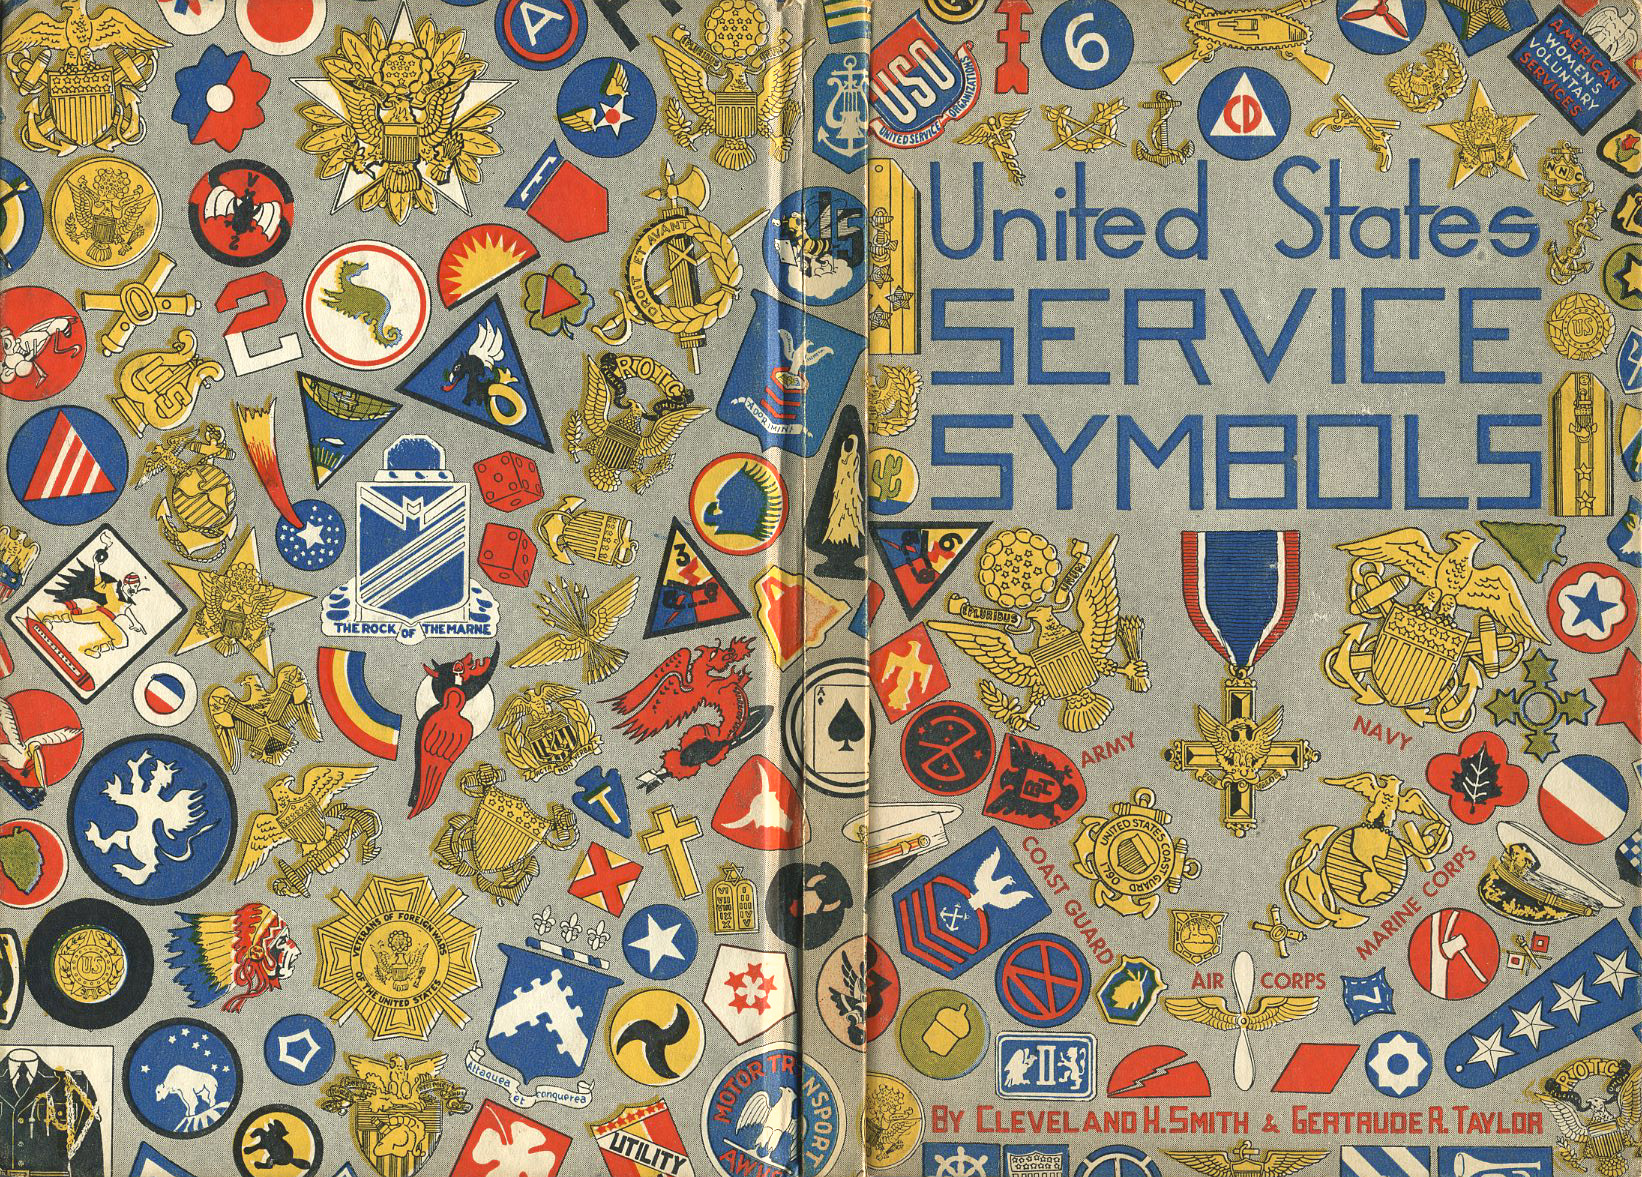 United States Service Symbols – 1942